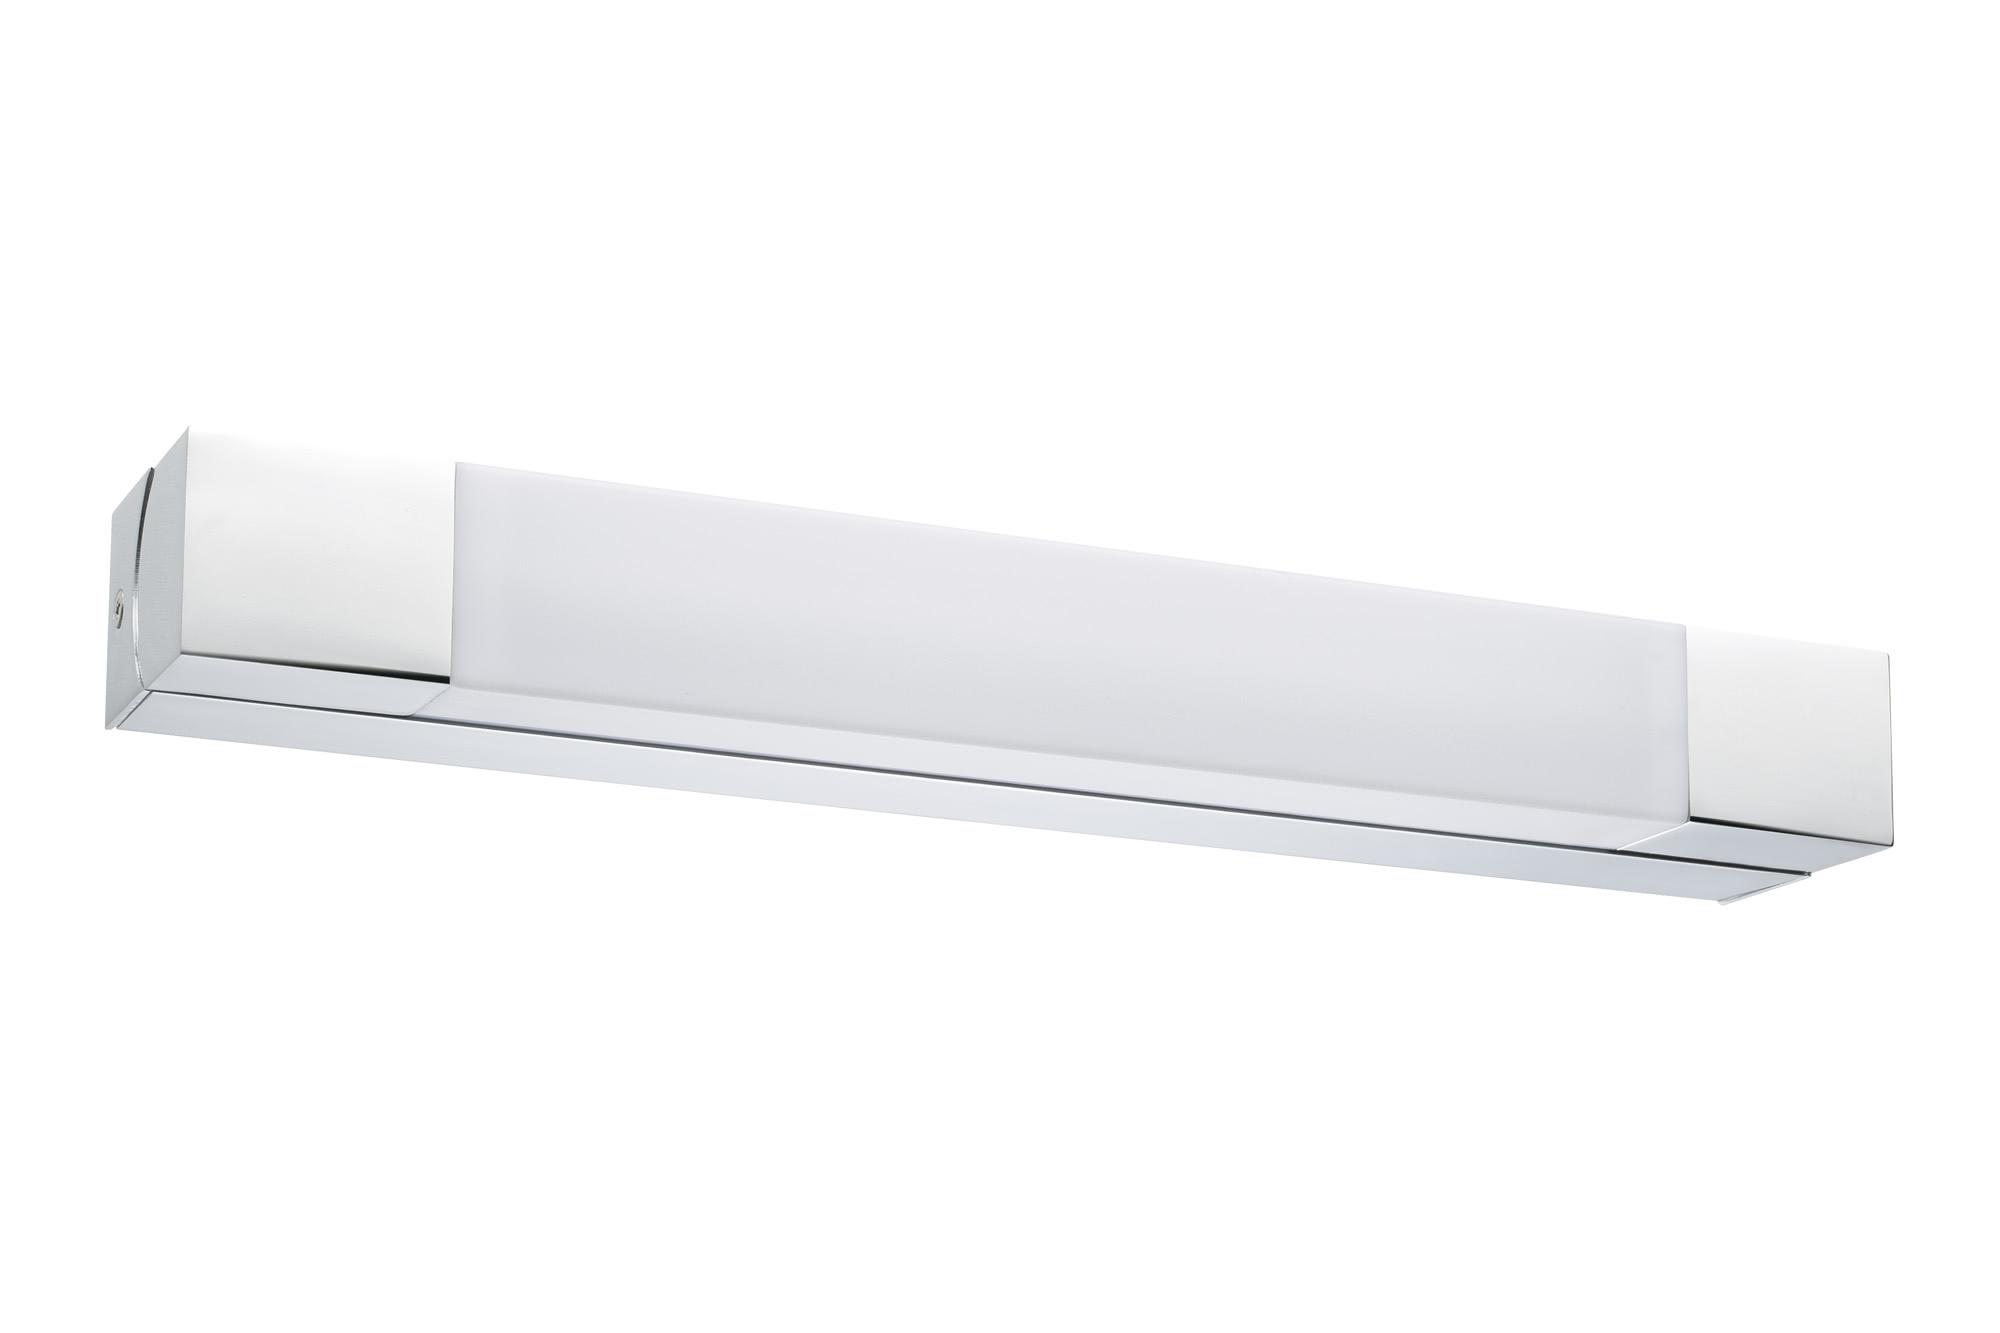 Paulmann. 70364 Светильник настенный 1x8W Quasar 230V G5 / T5 Хром/Белый